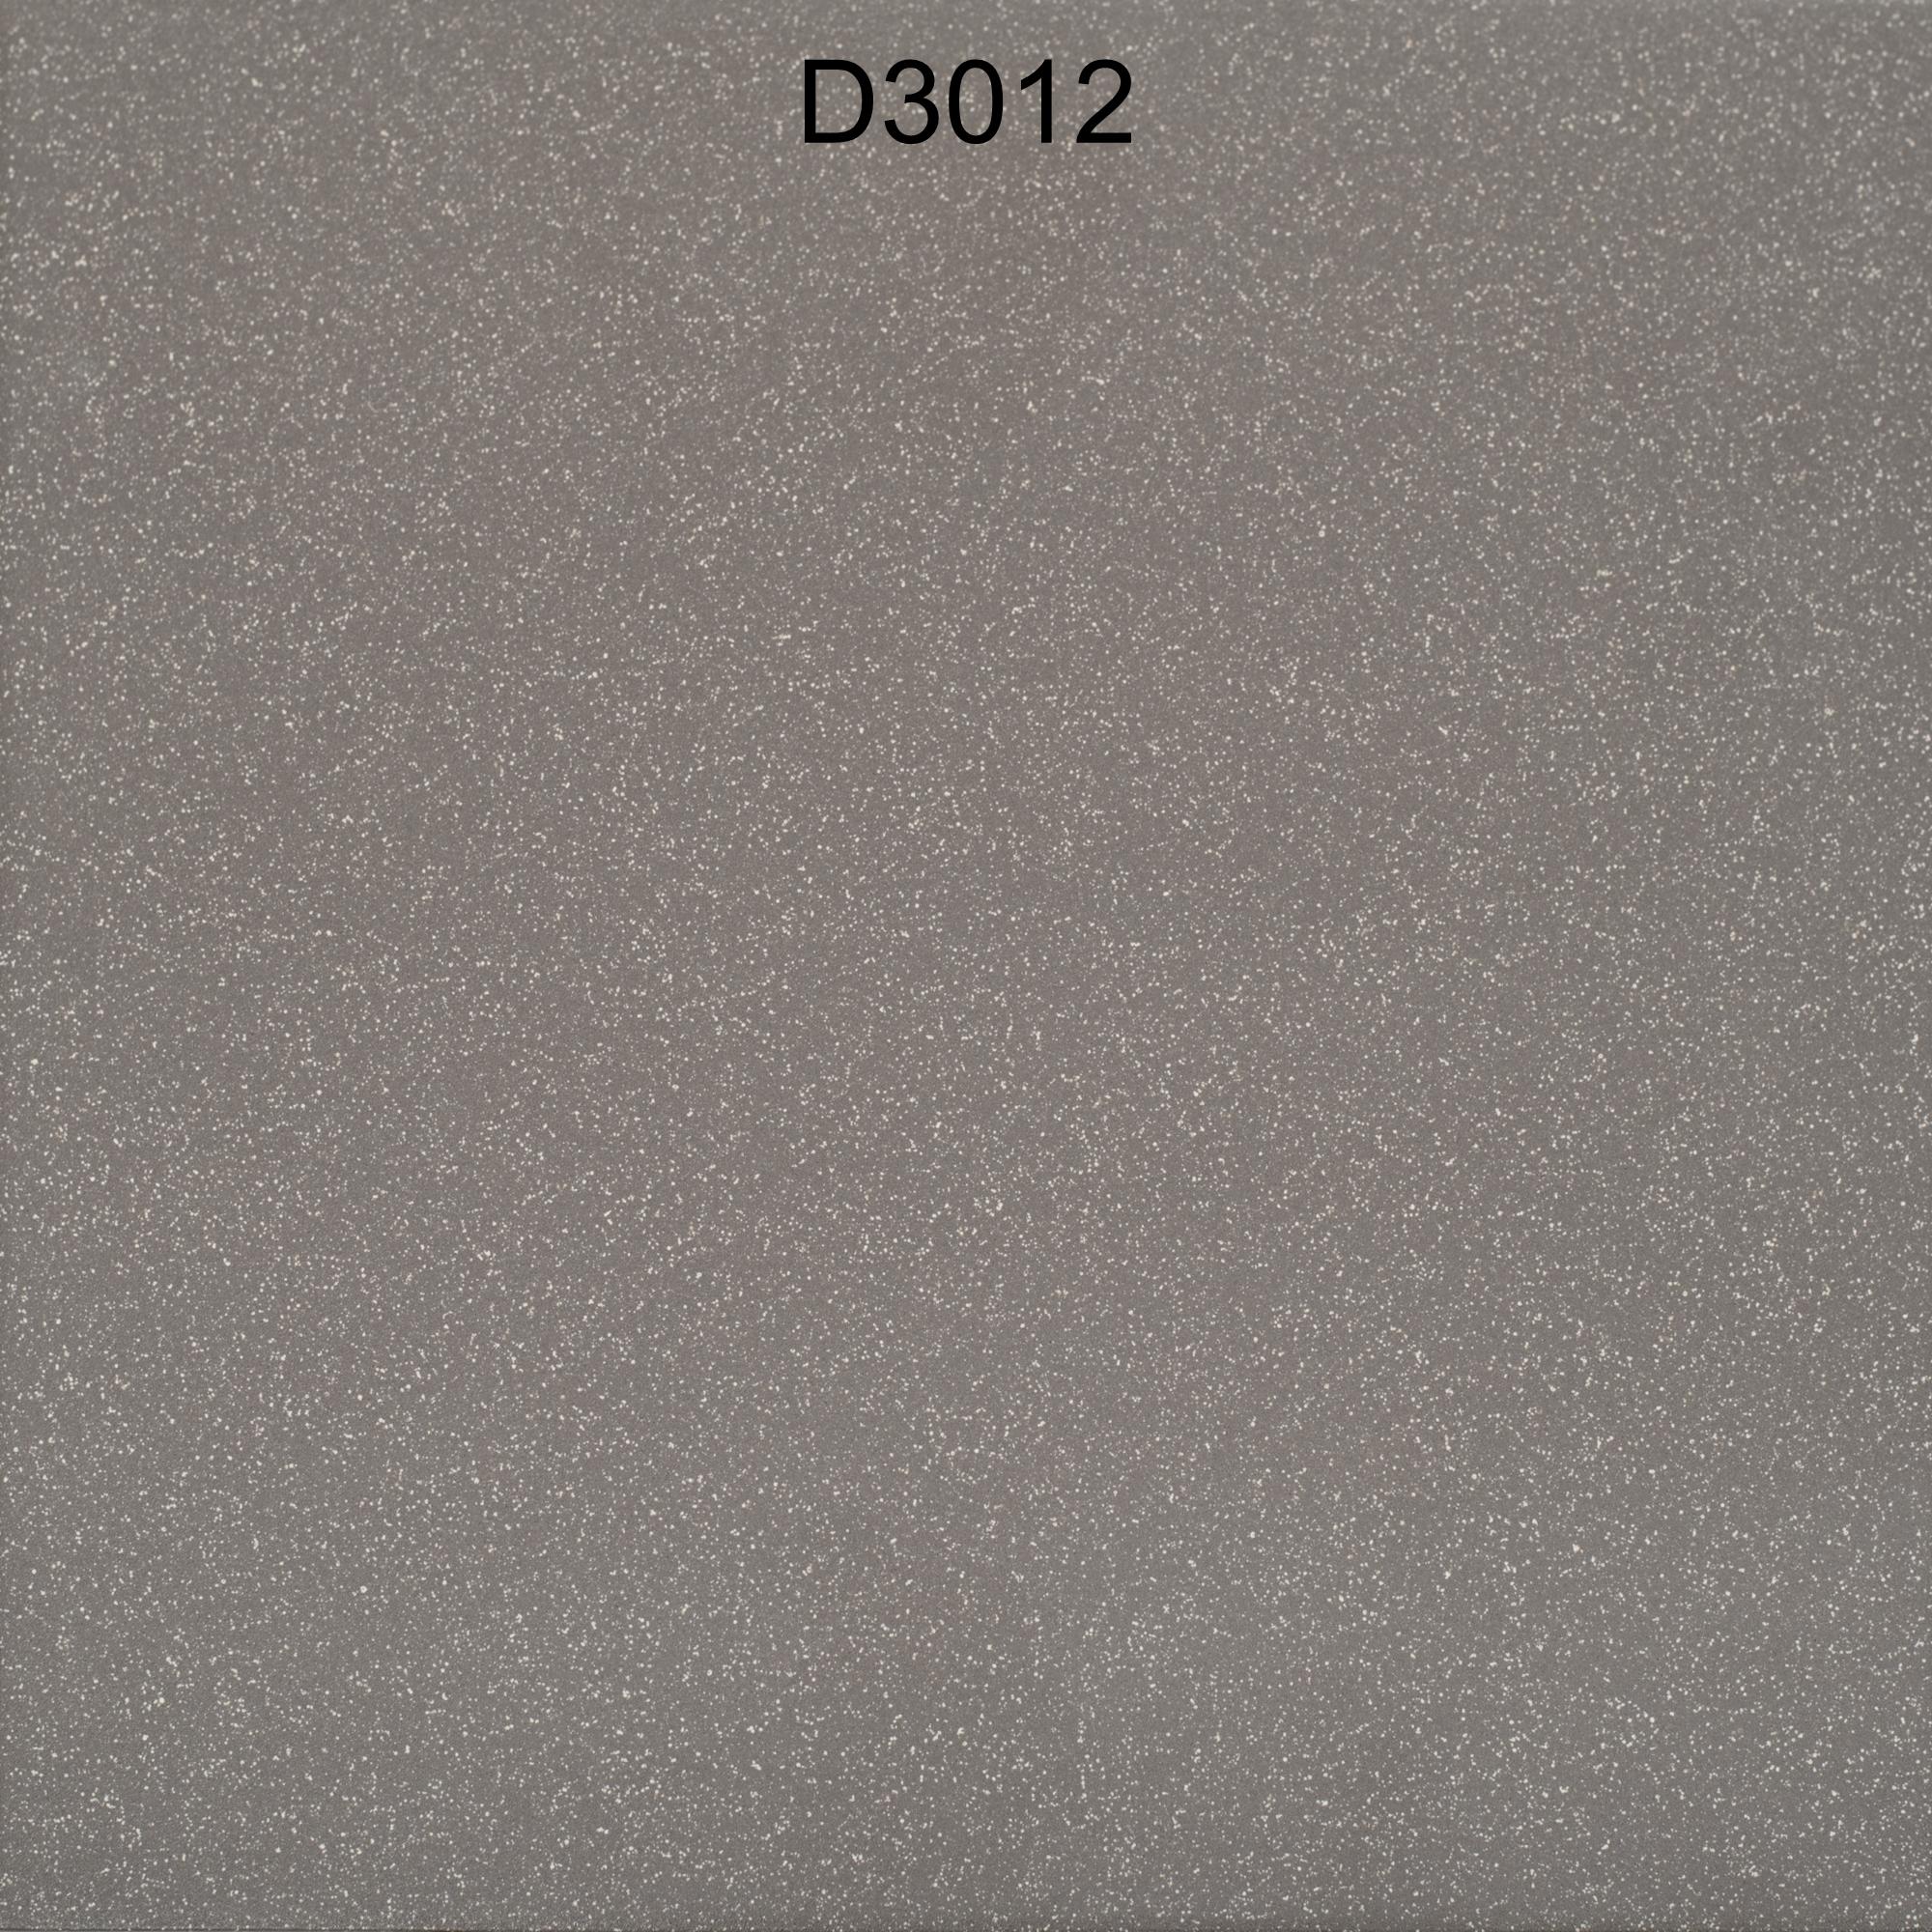 D3012